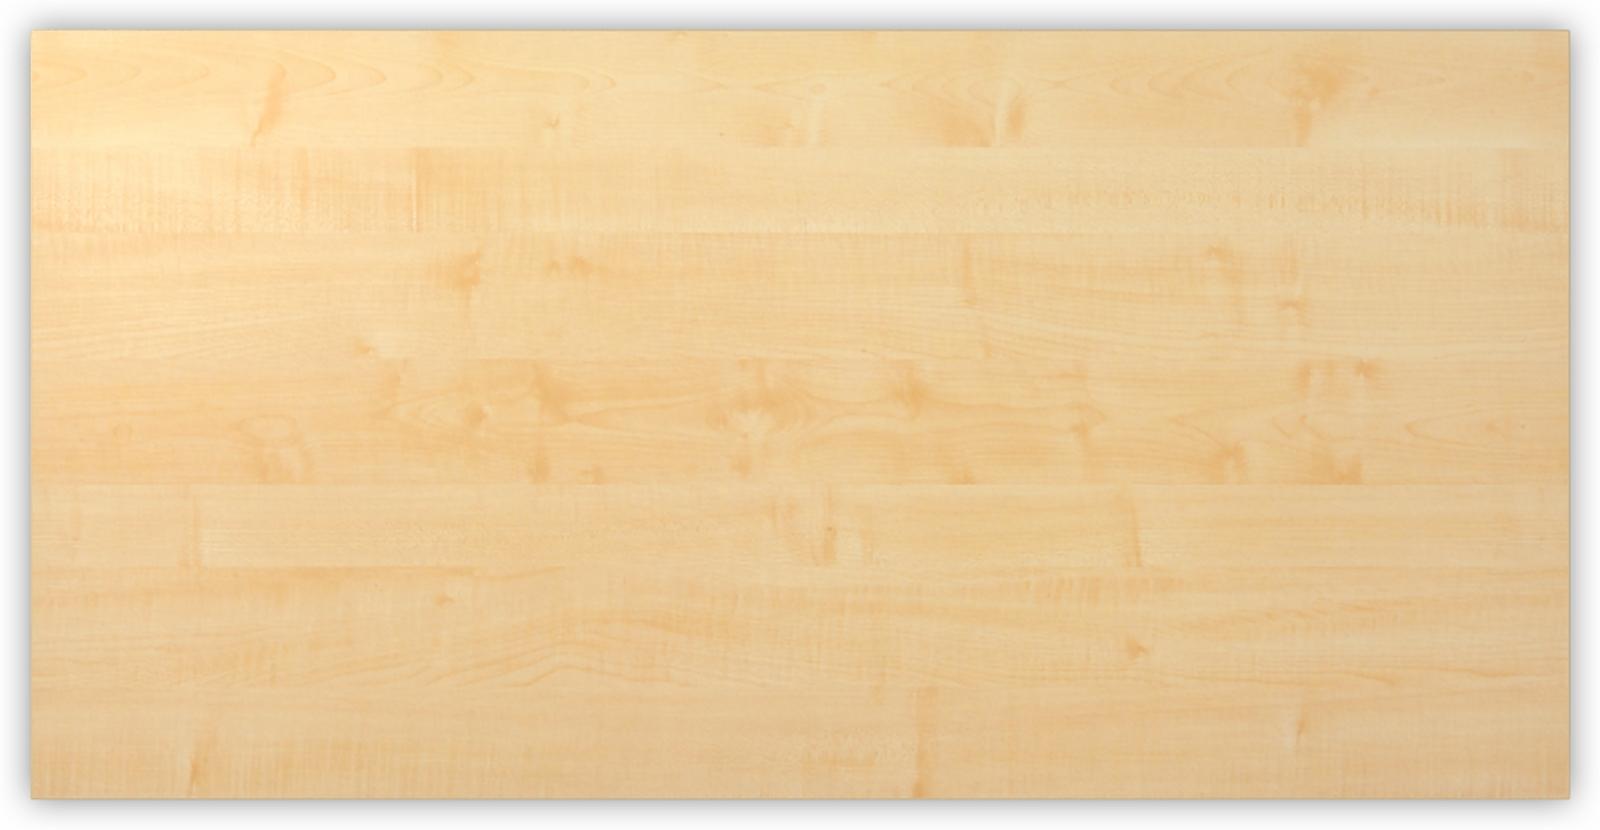 Schreibtischplatte tischplatte b rotischplatte holzplatte for Schreibtischplatte buche